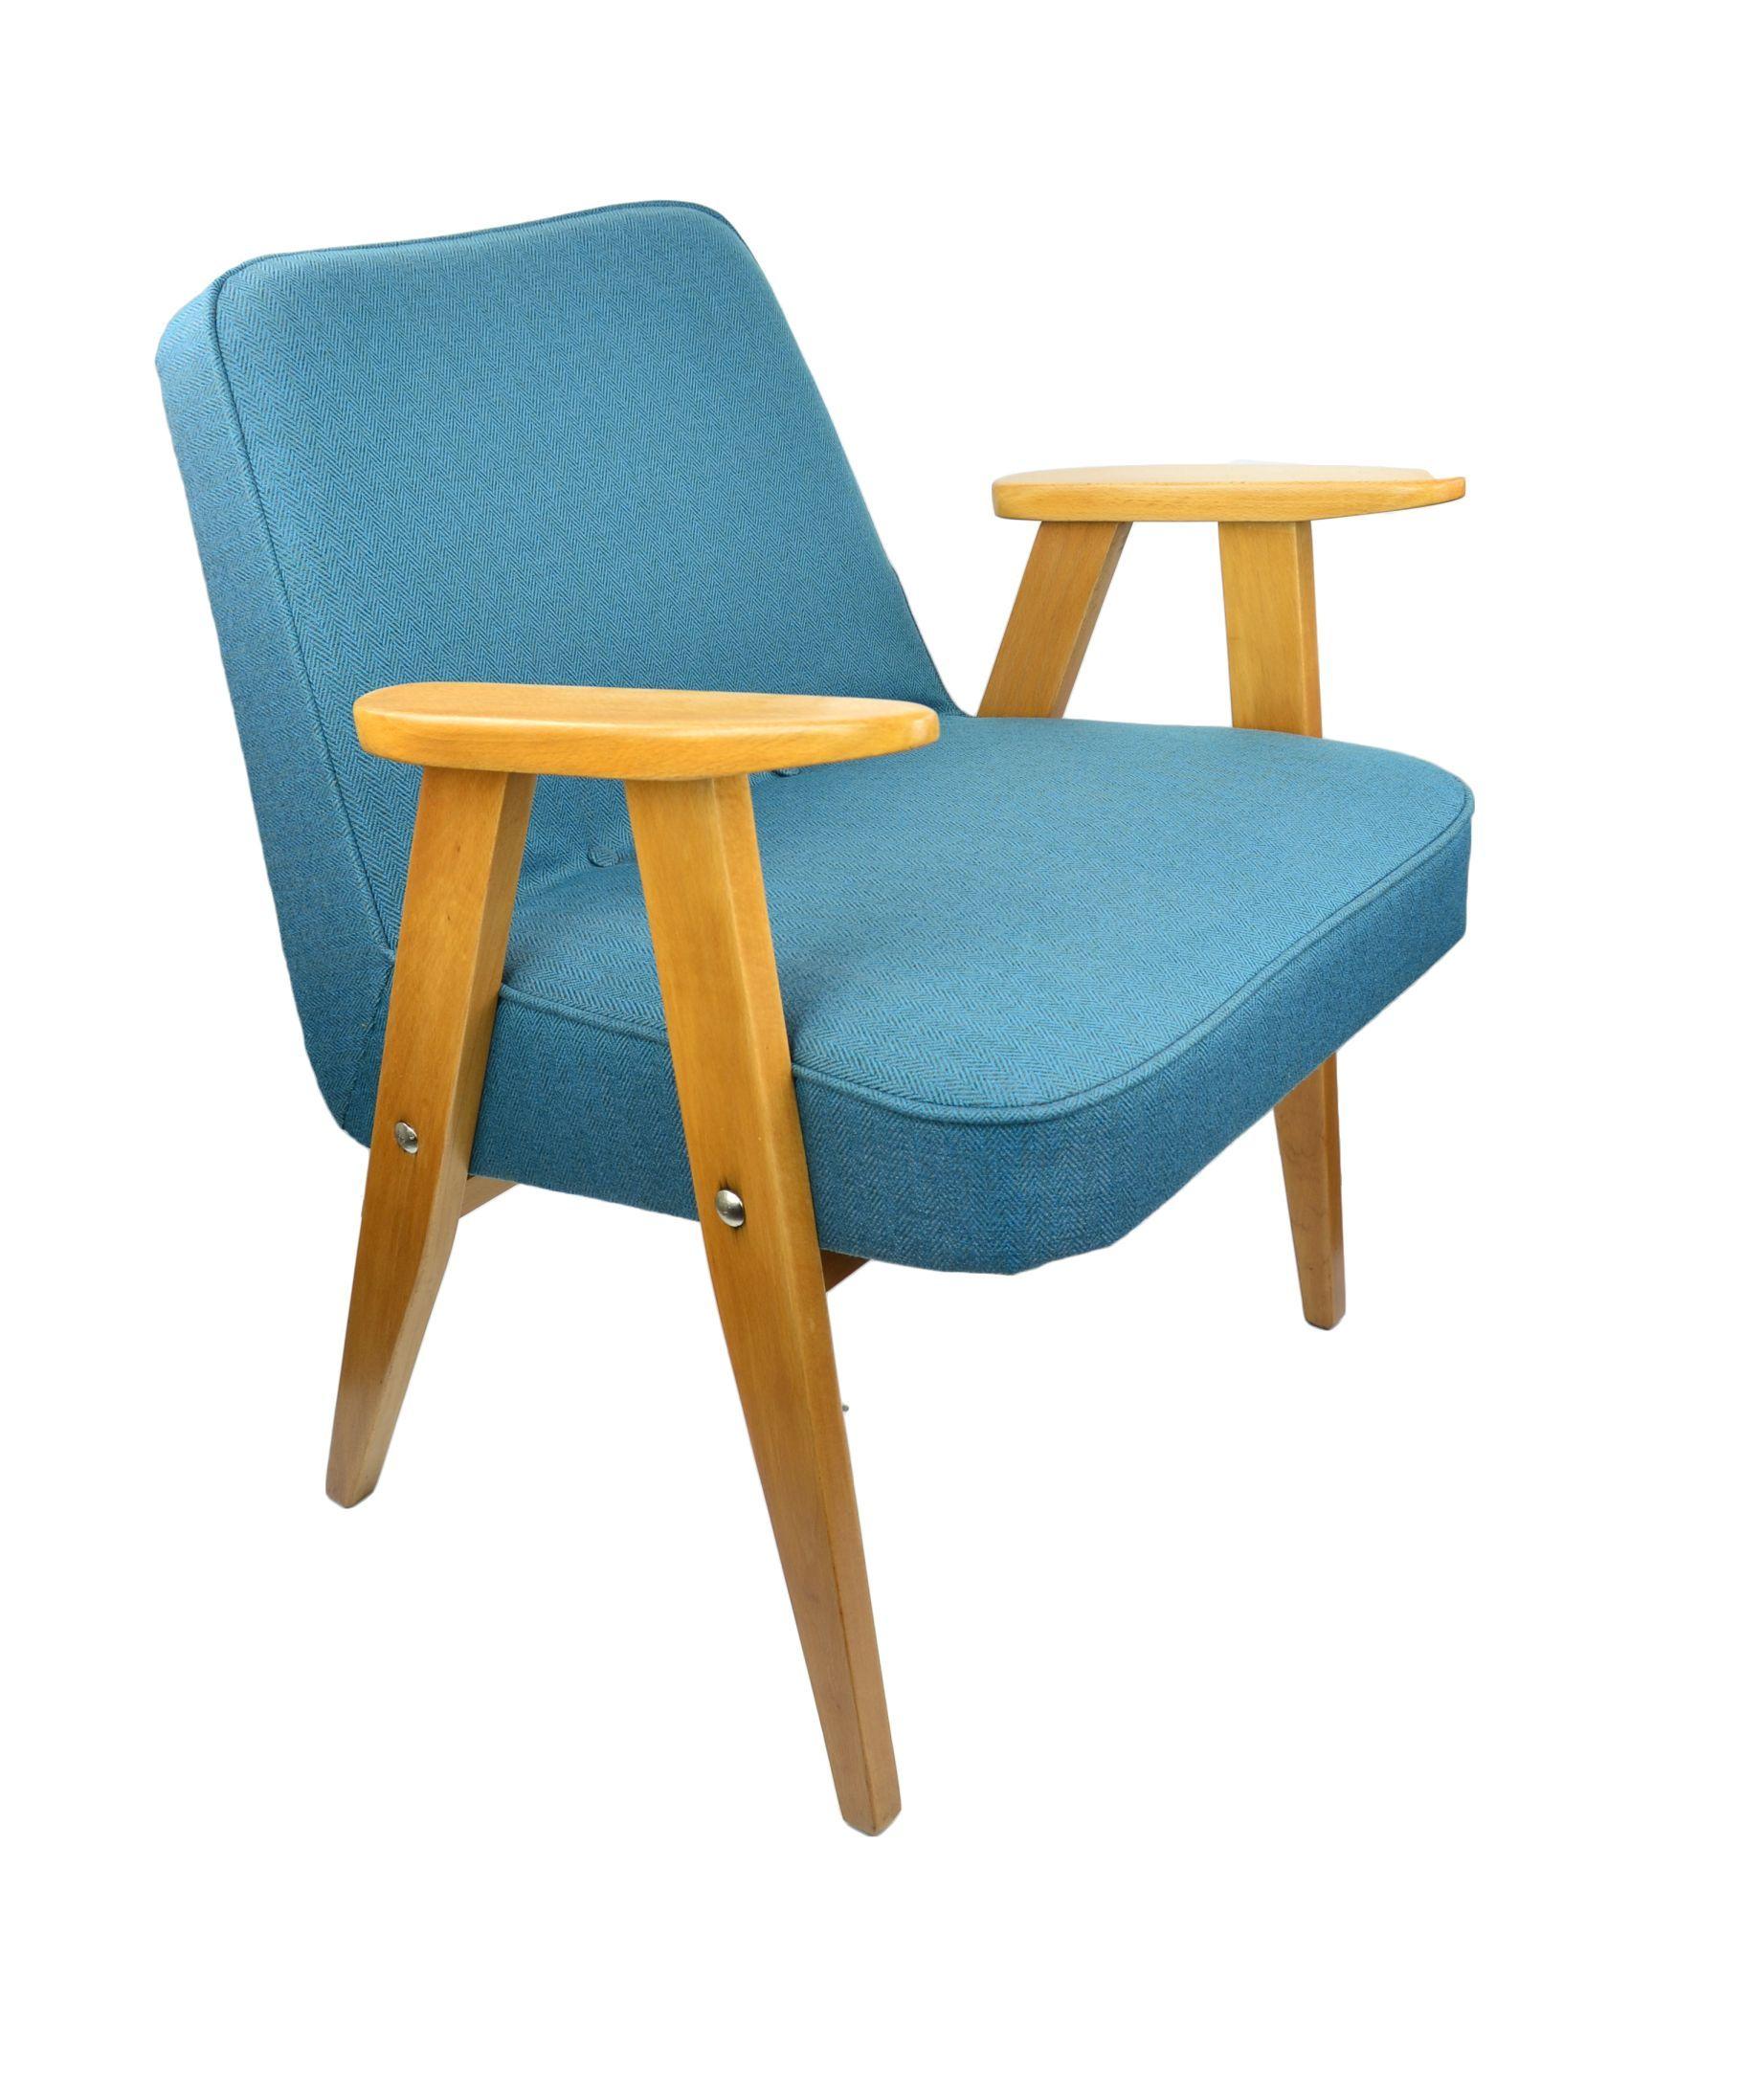 Prl Fotel Chierowski 366 Turkusowy Turkus Jodelka 6648630335 Oficjalne Archiwum Allegro Soto Chair Chair Accent Chairs